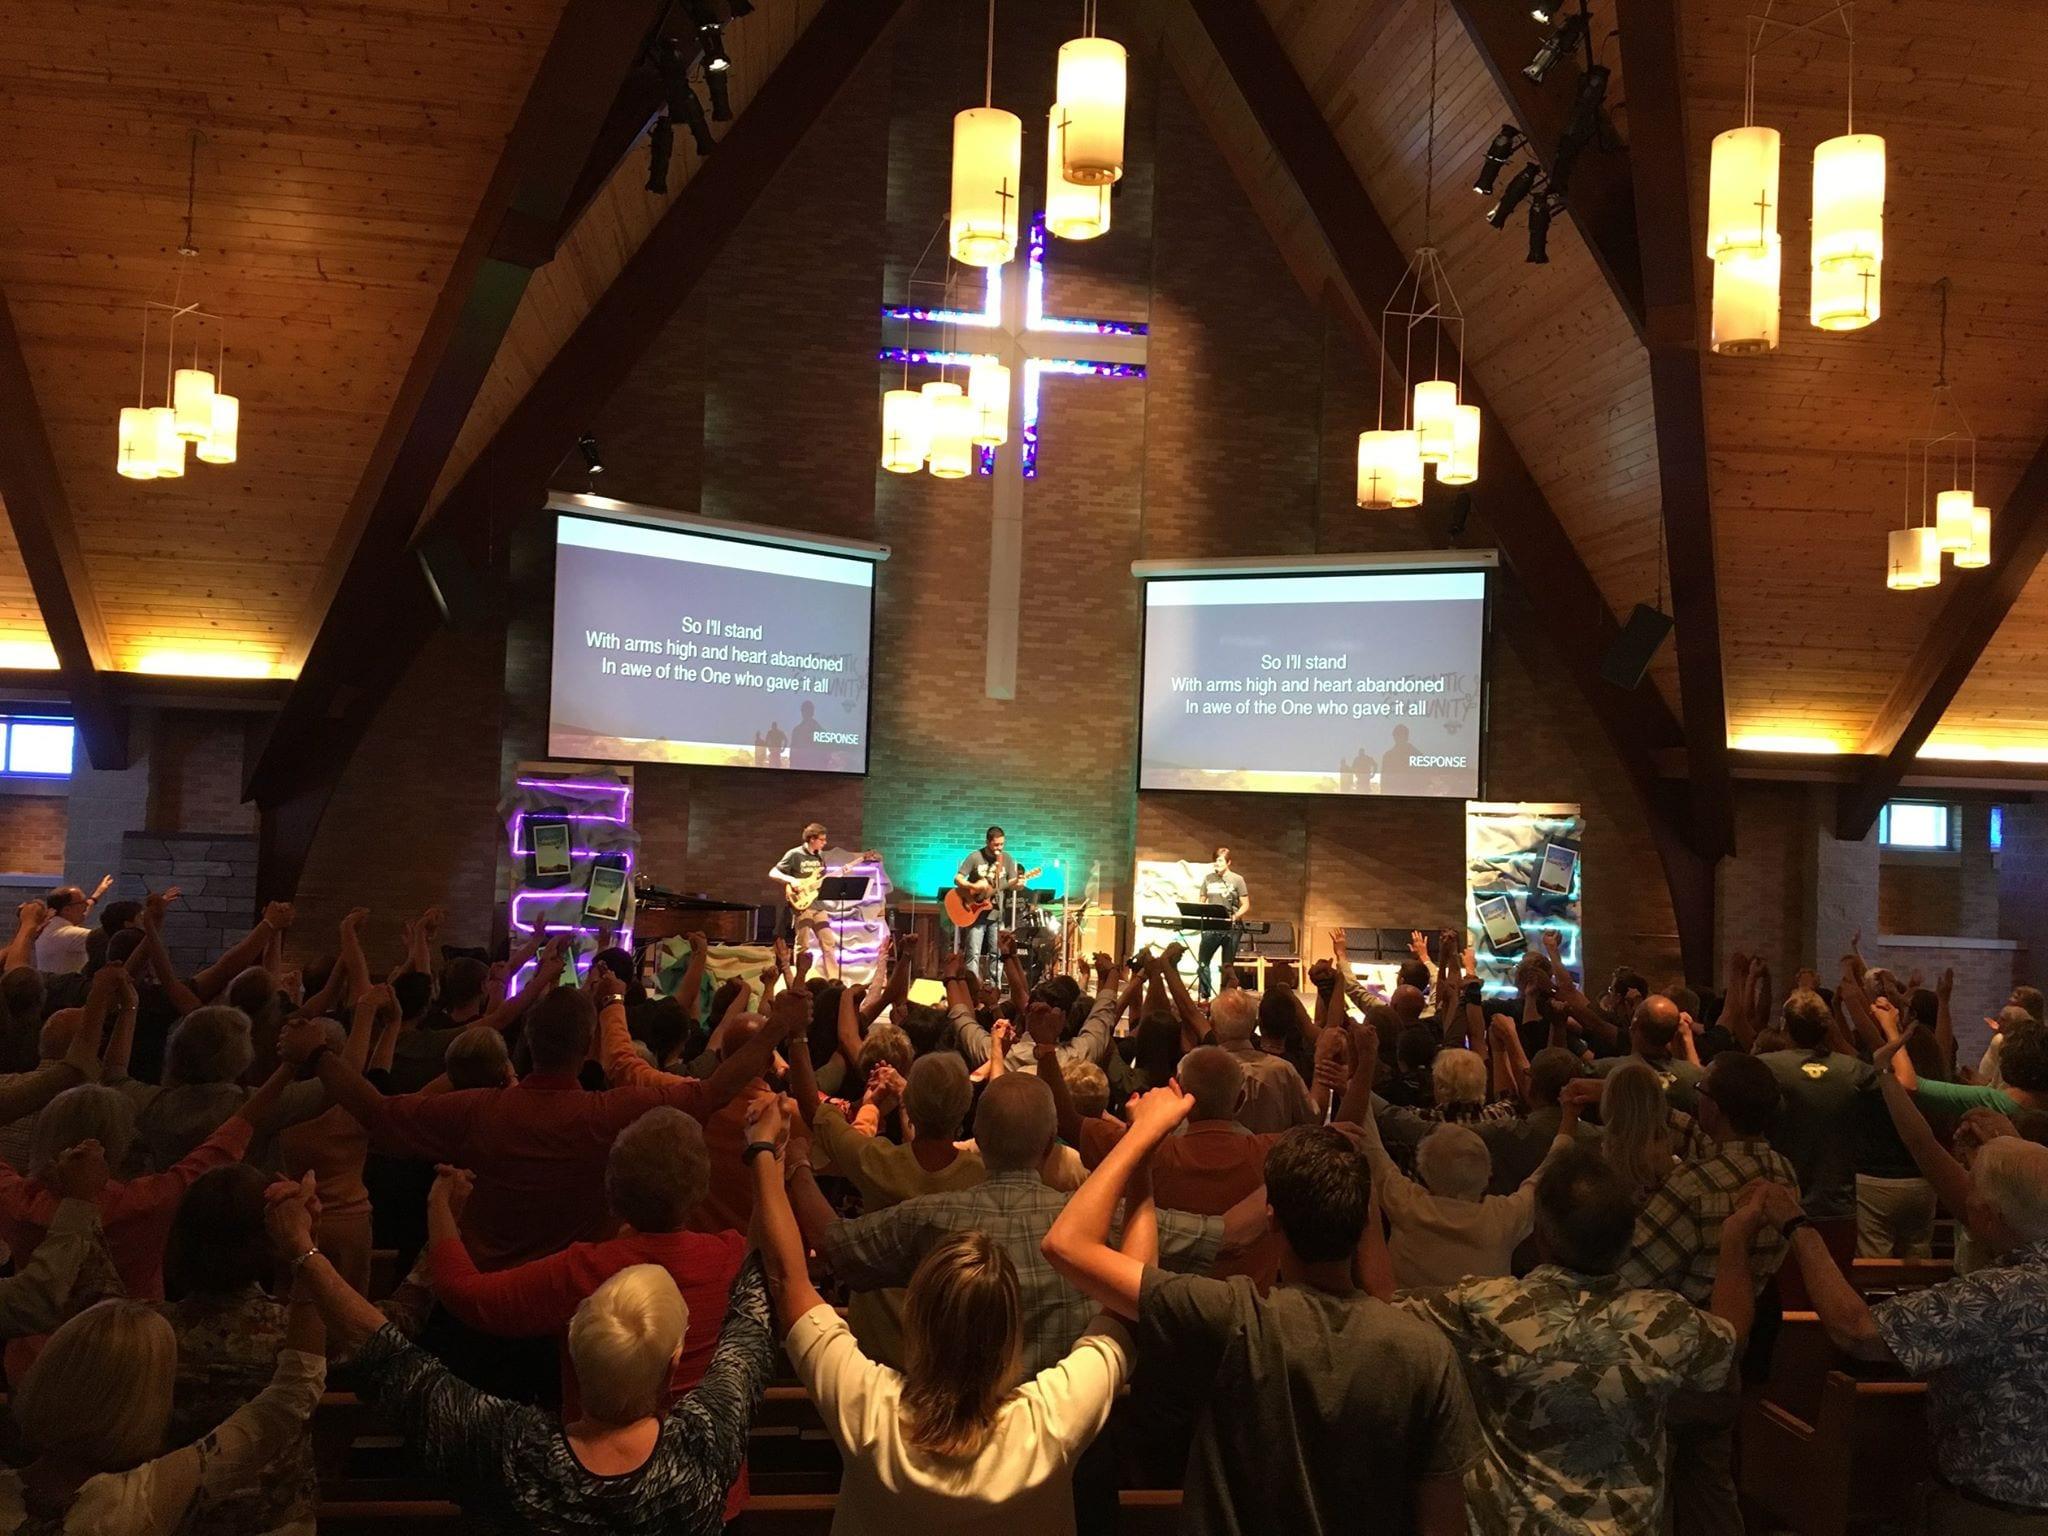 Sunday Morning Worship at Holland SERVE